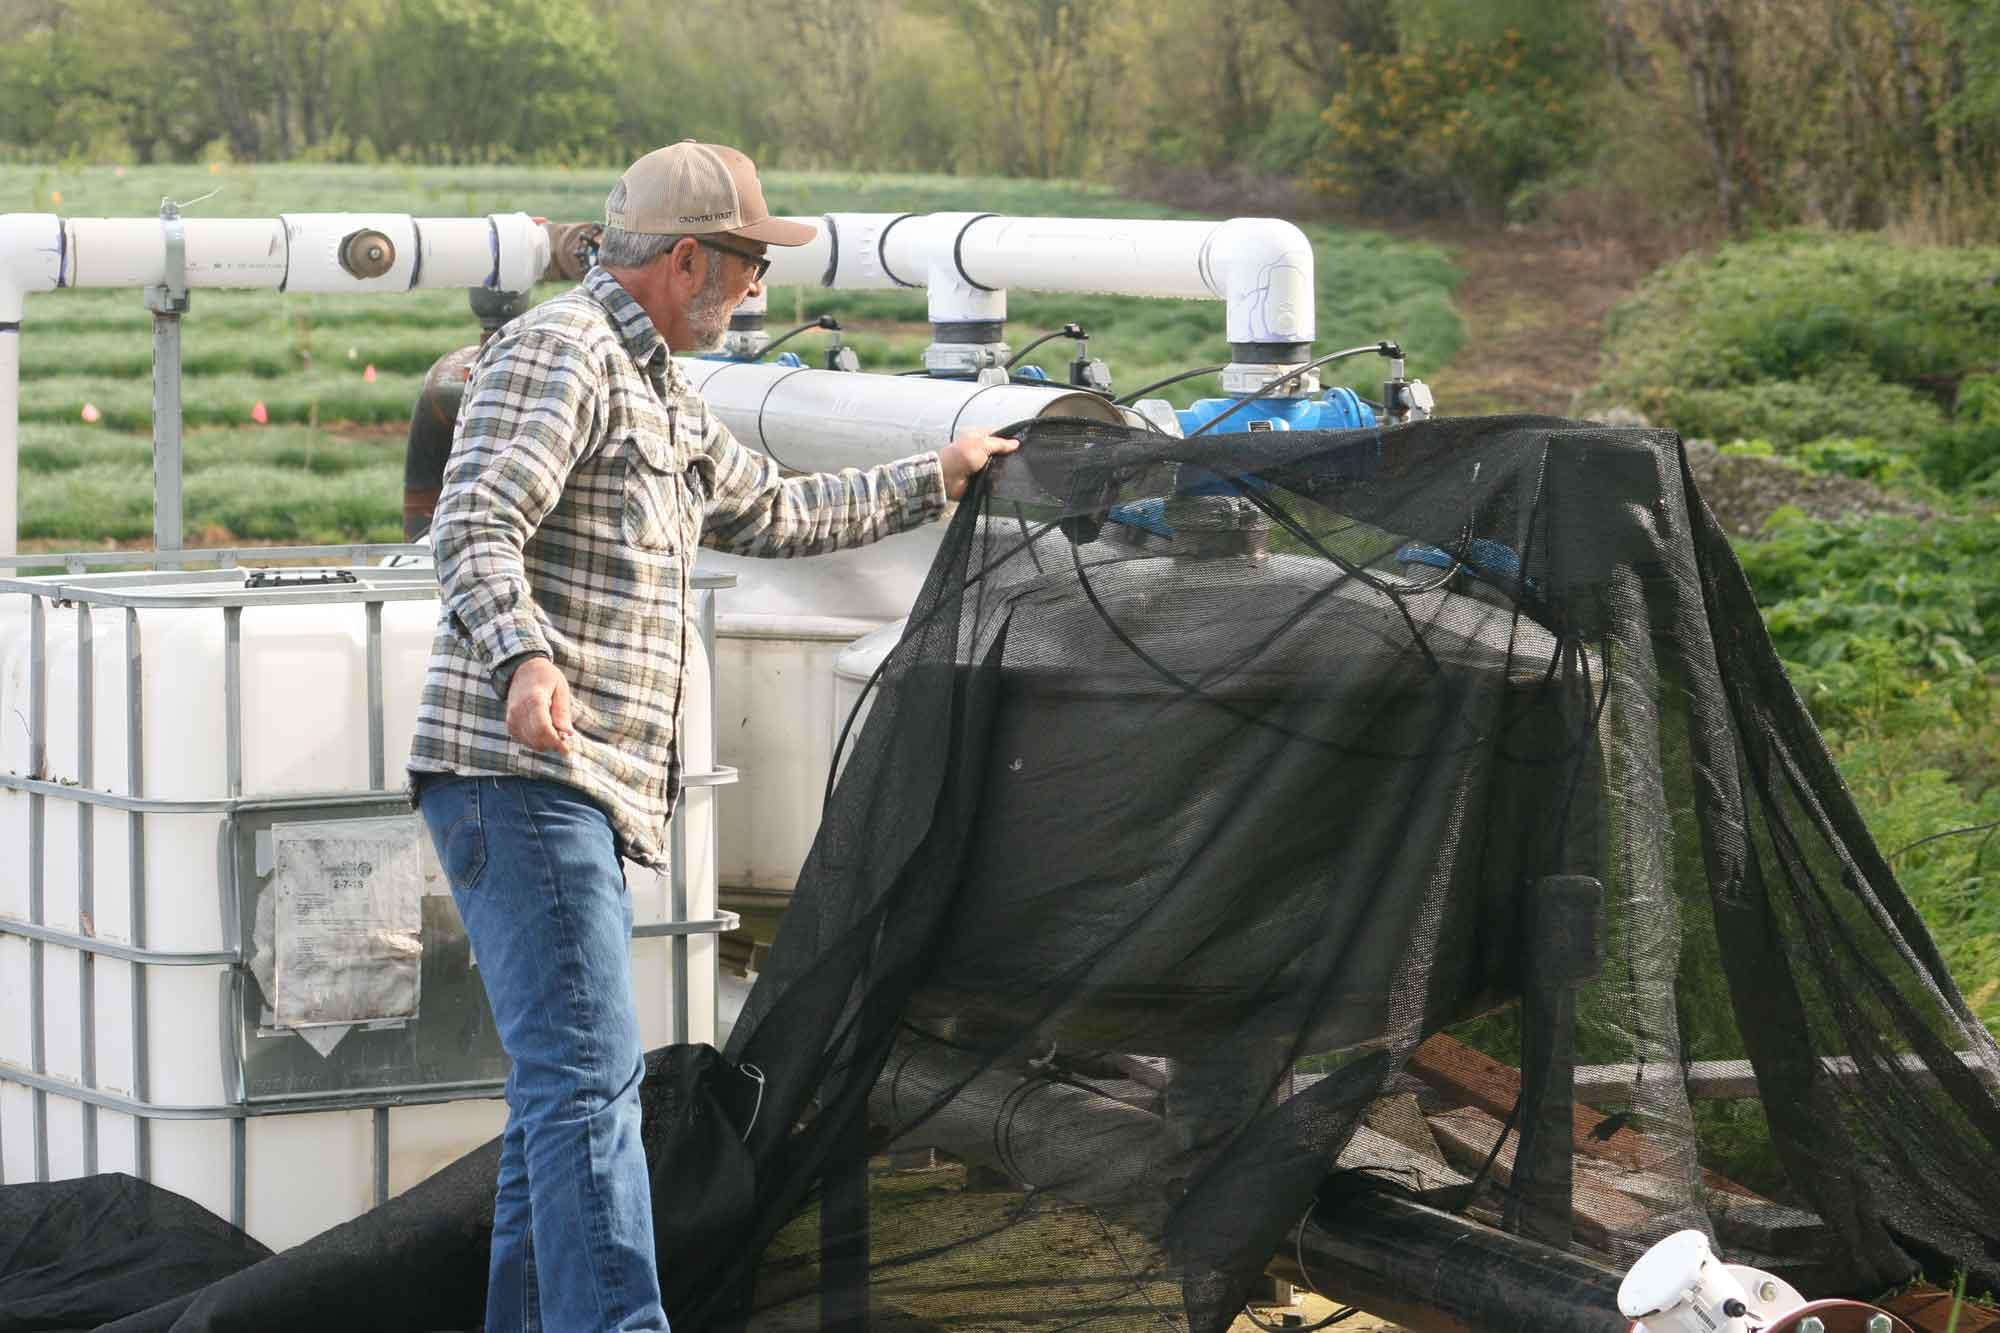 Preparing for irrigation season